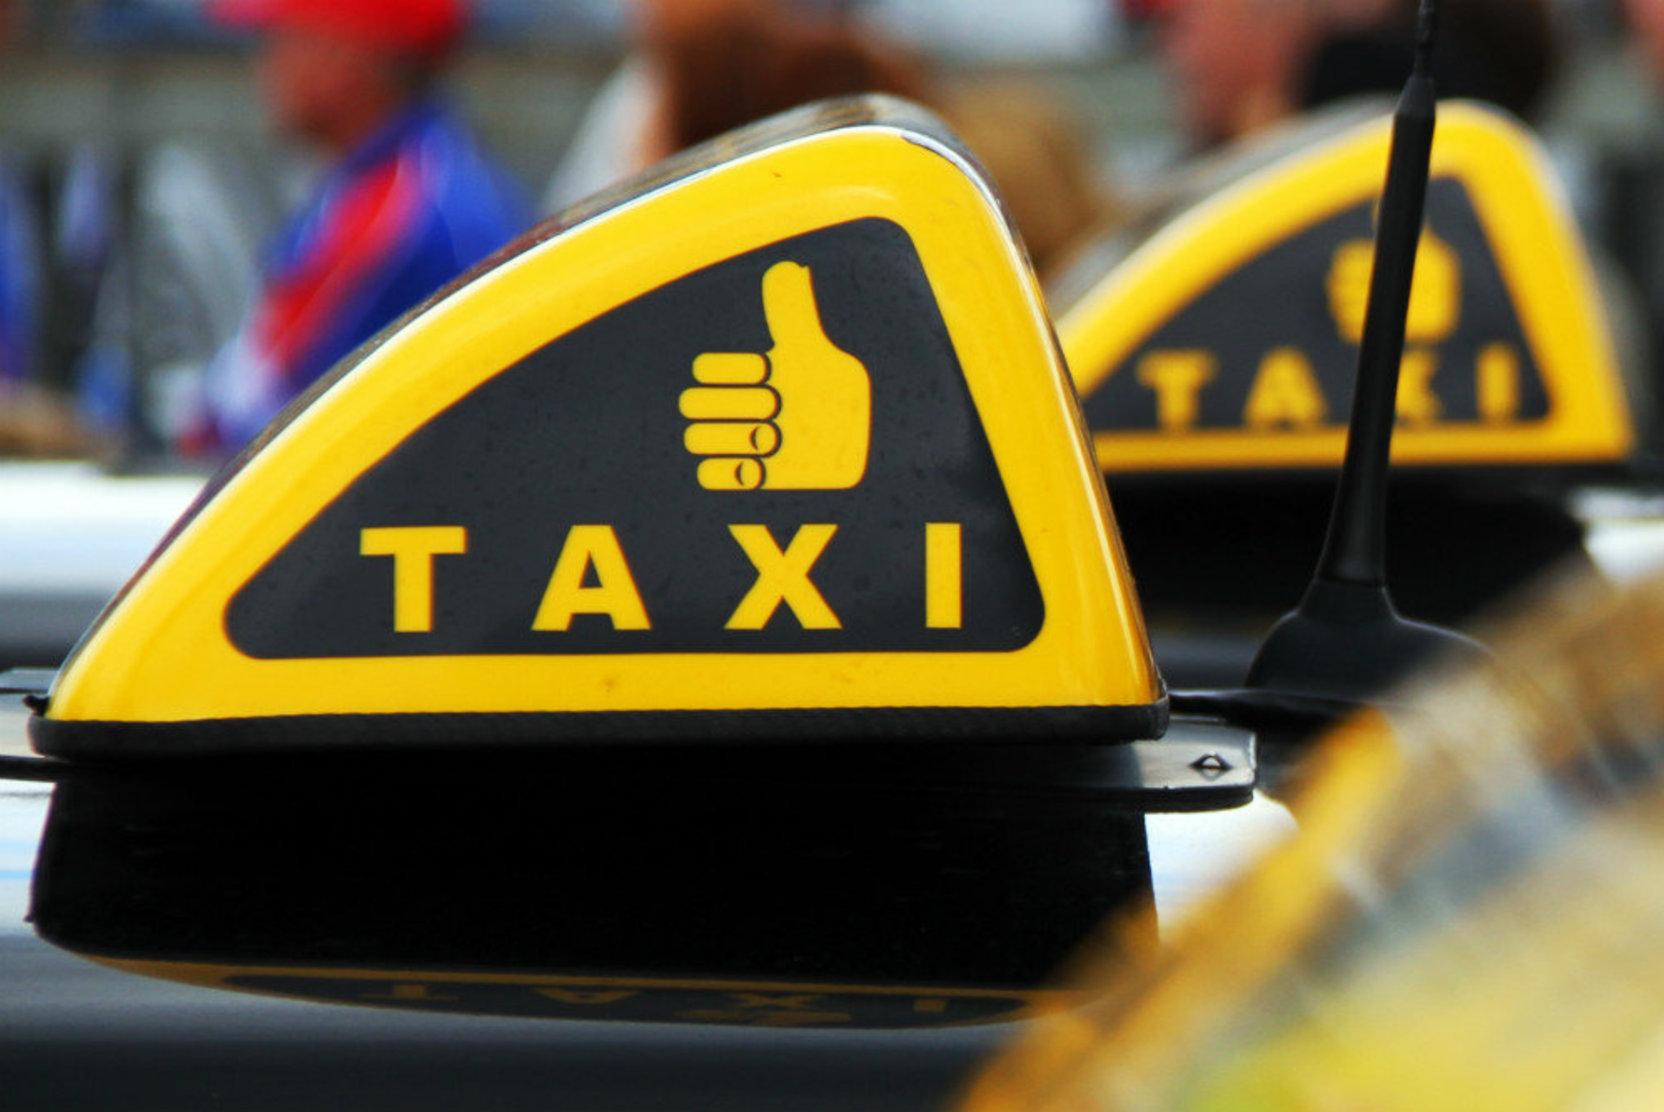 Taxi lex